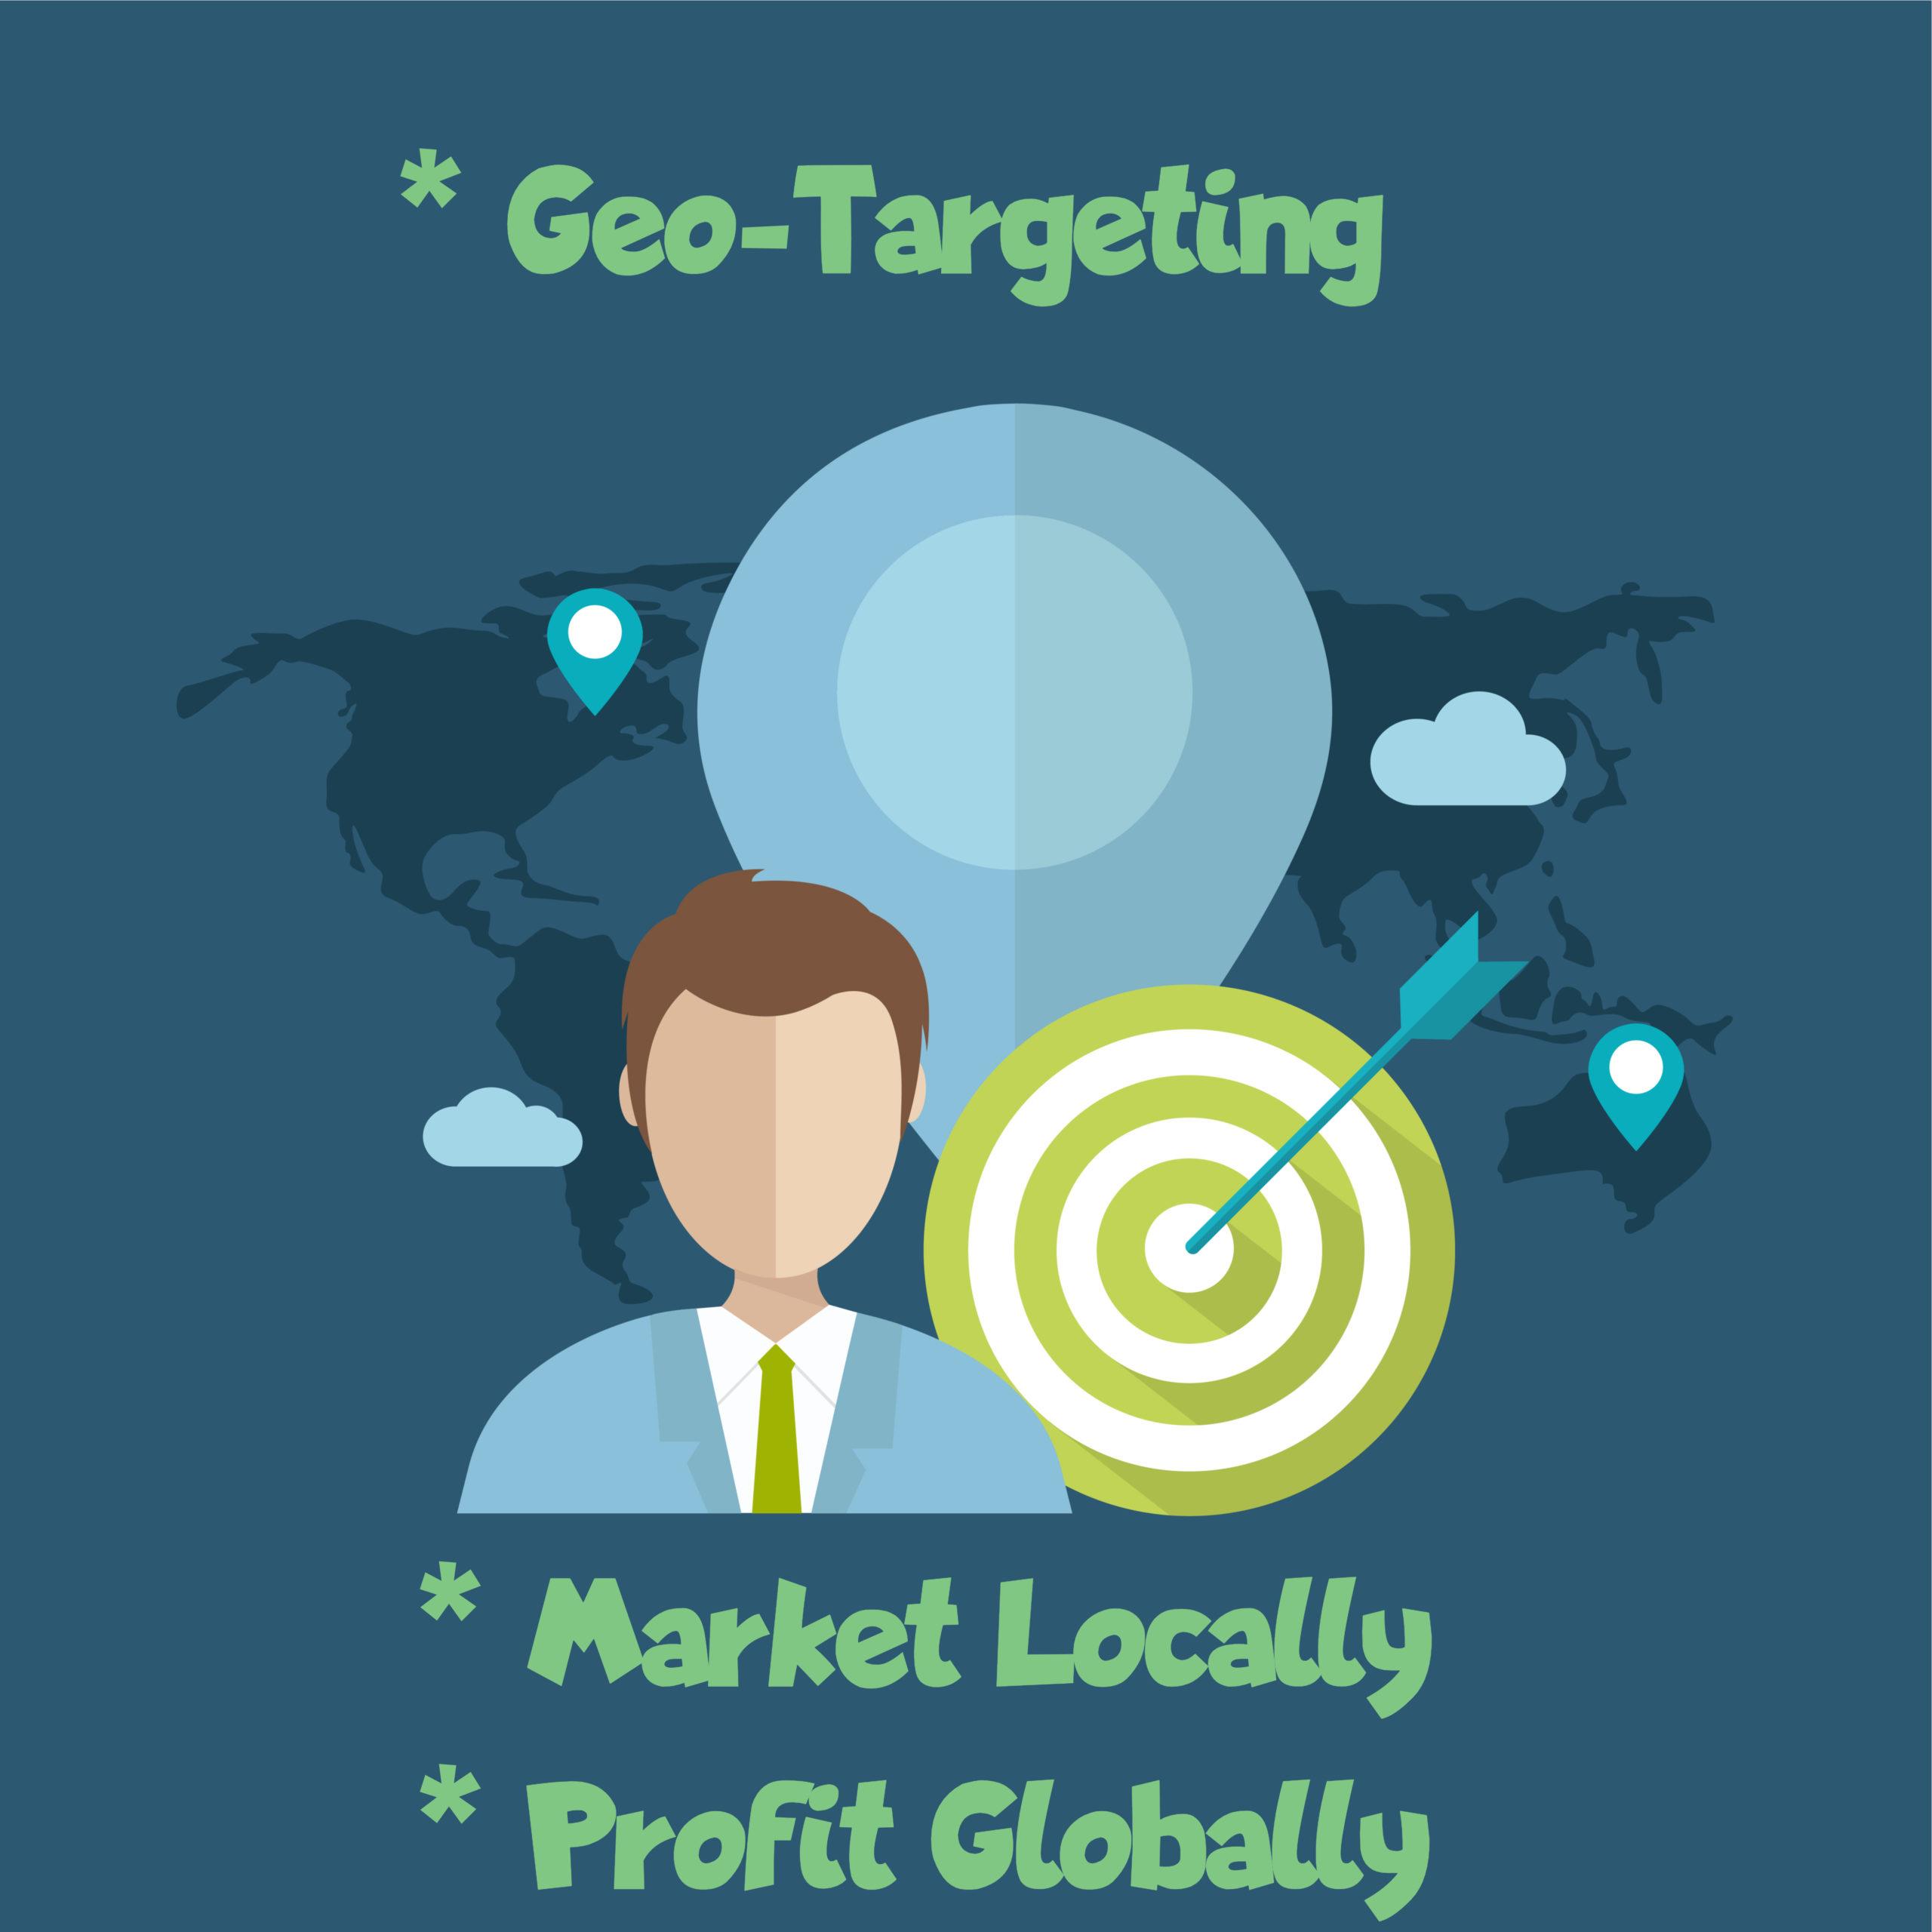 Geo-Targeting: Market Locally – Profit Globally